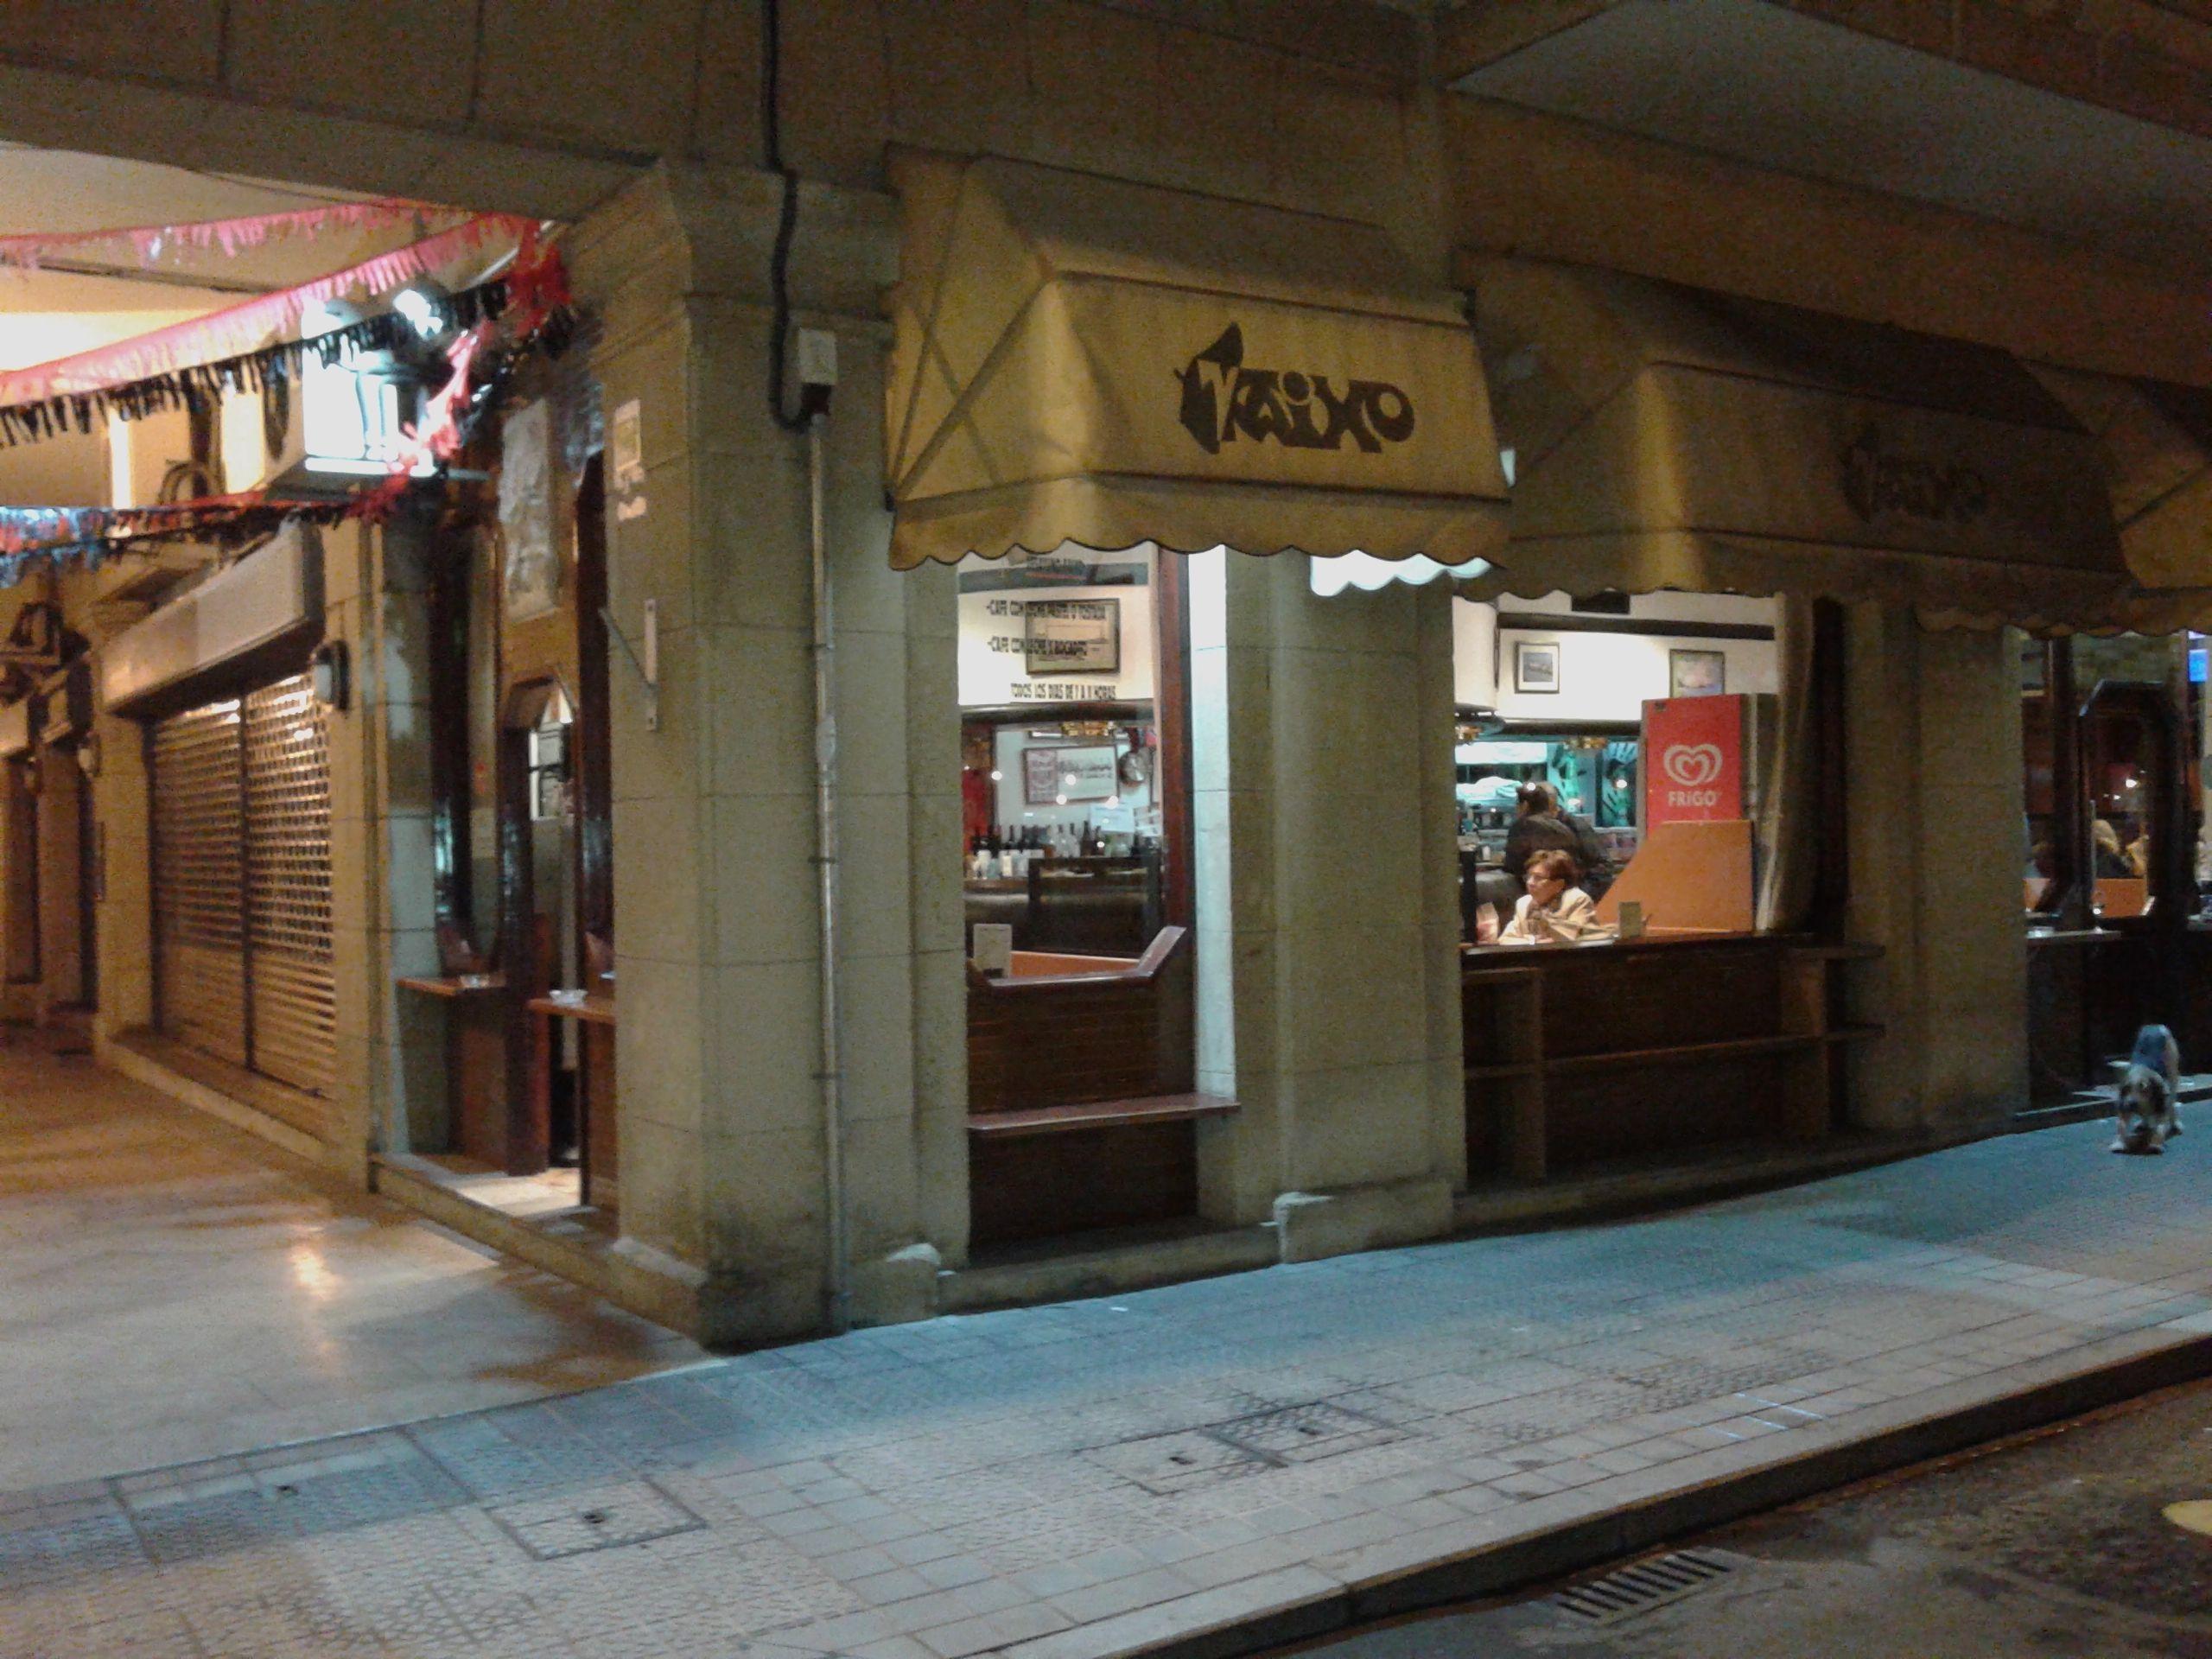 Kaixo Bar C Tomas Olabarri 15 48930 Las Arenas Getxo Tel  # Muebles Olabarri